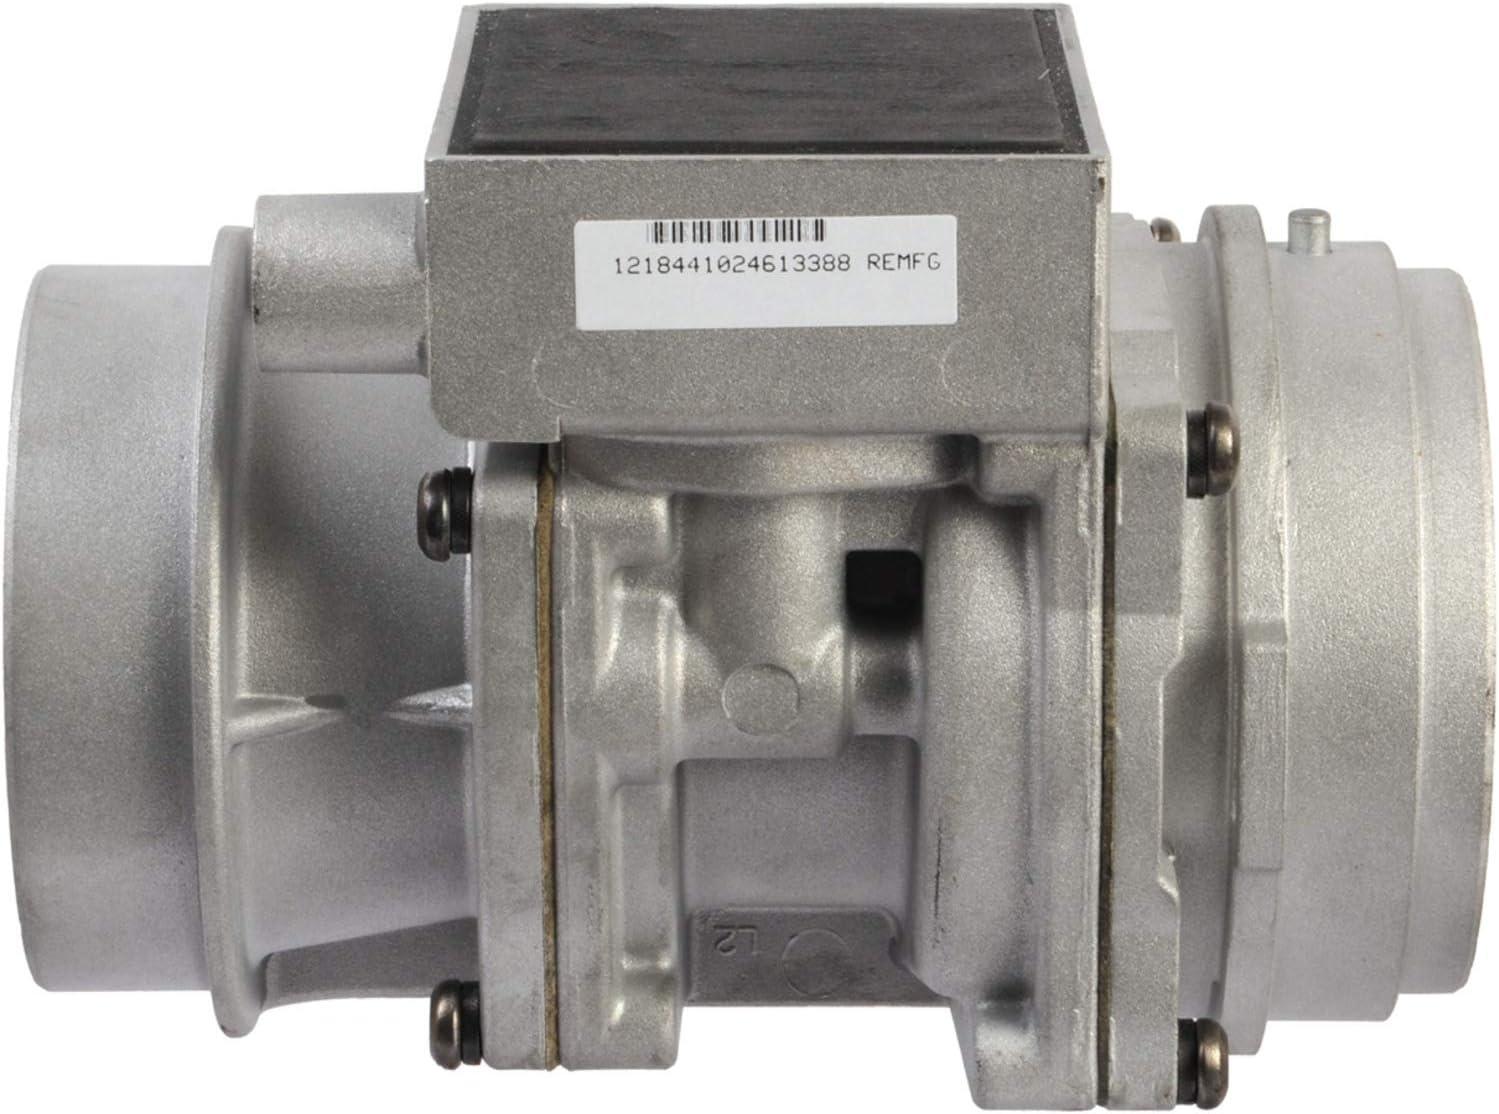 Cardone 74-10246 Remanufactured Mass Max 73% OFF MAFS Popular brand Sensor Airflow